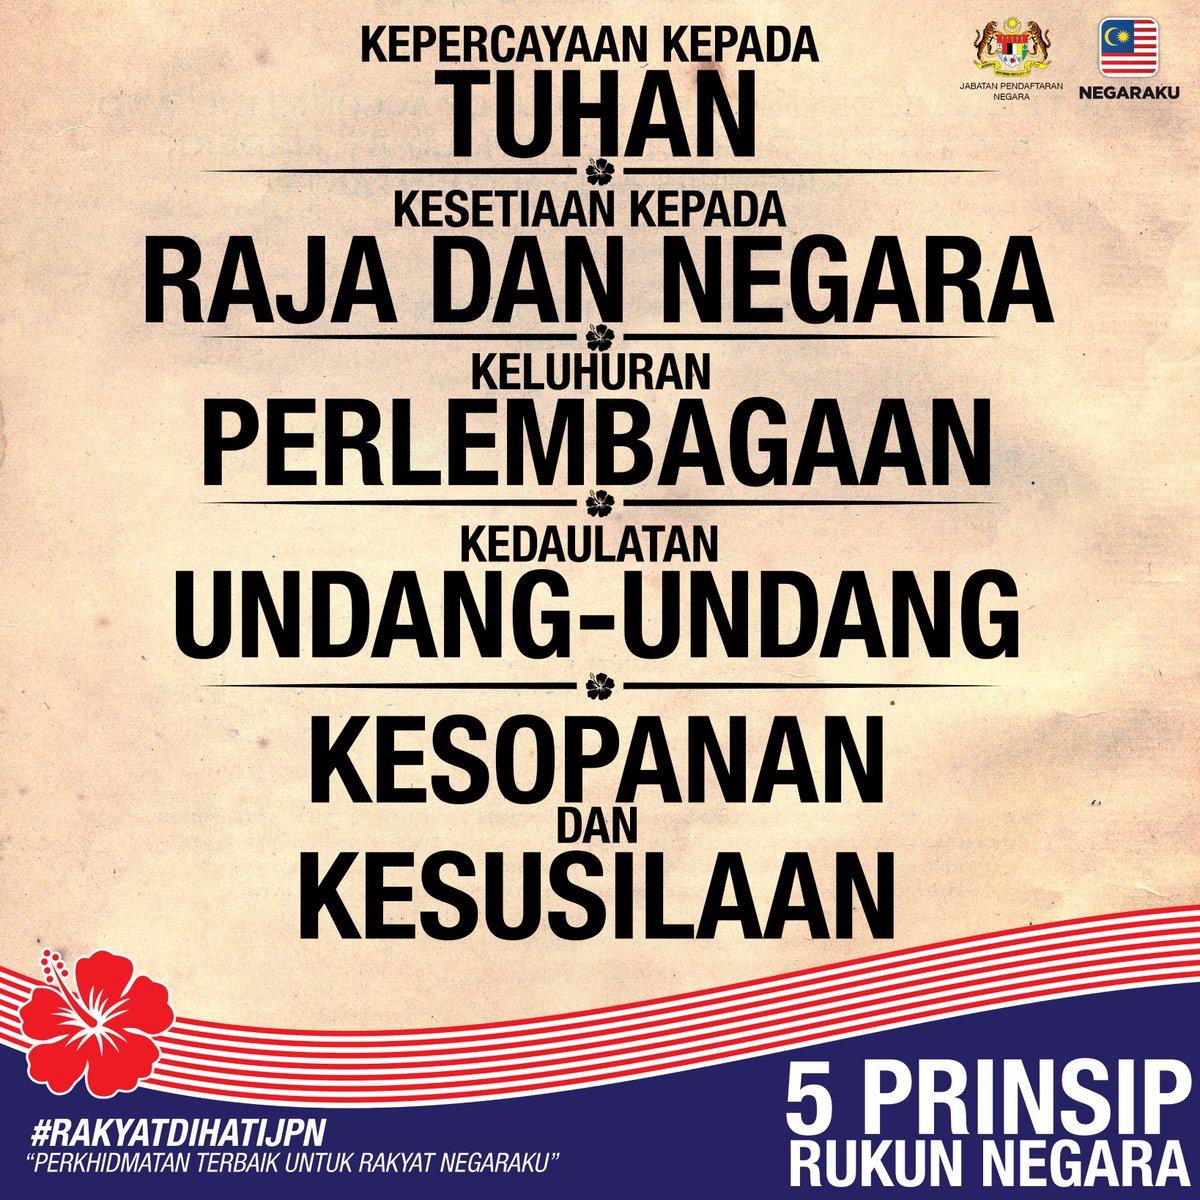 Jpn Malaysia On Twitter Pengurniaan Kewarganegaraan Malaysia Merupakan Anugerah Tertinggi Dan Hak Mutlak Kerajaan Persekutuan Hayatilah 5 Prinsip Rukun Negara Https T Co Dhno63oth6